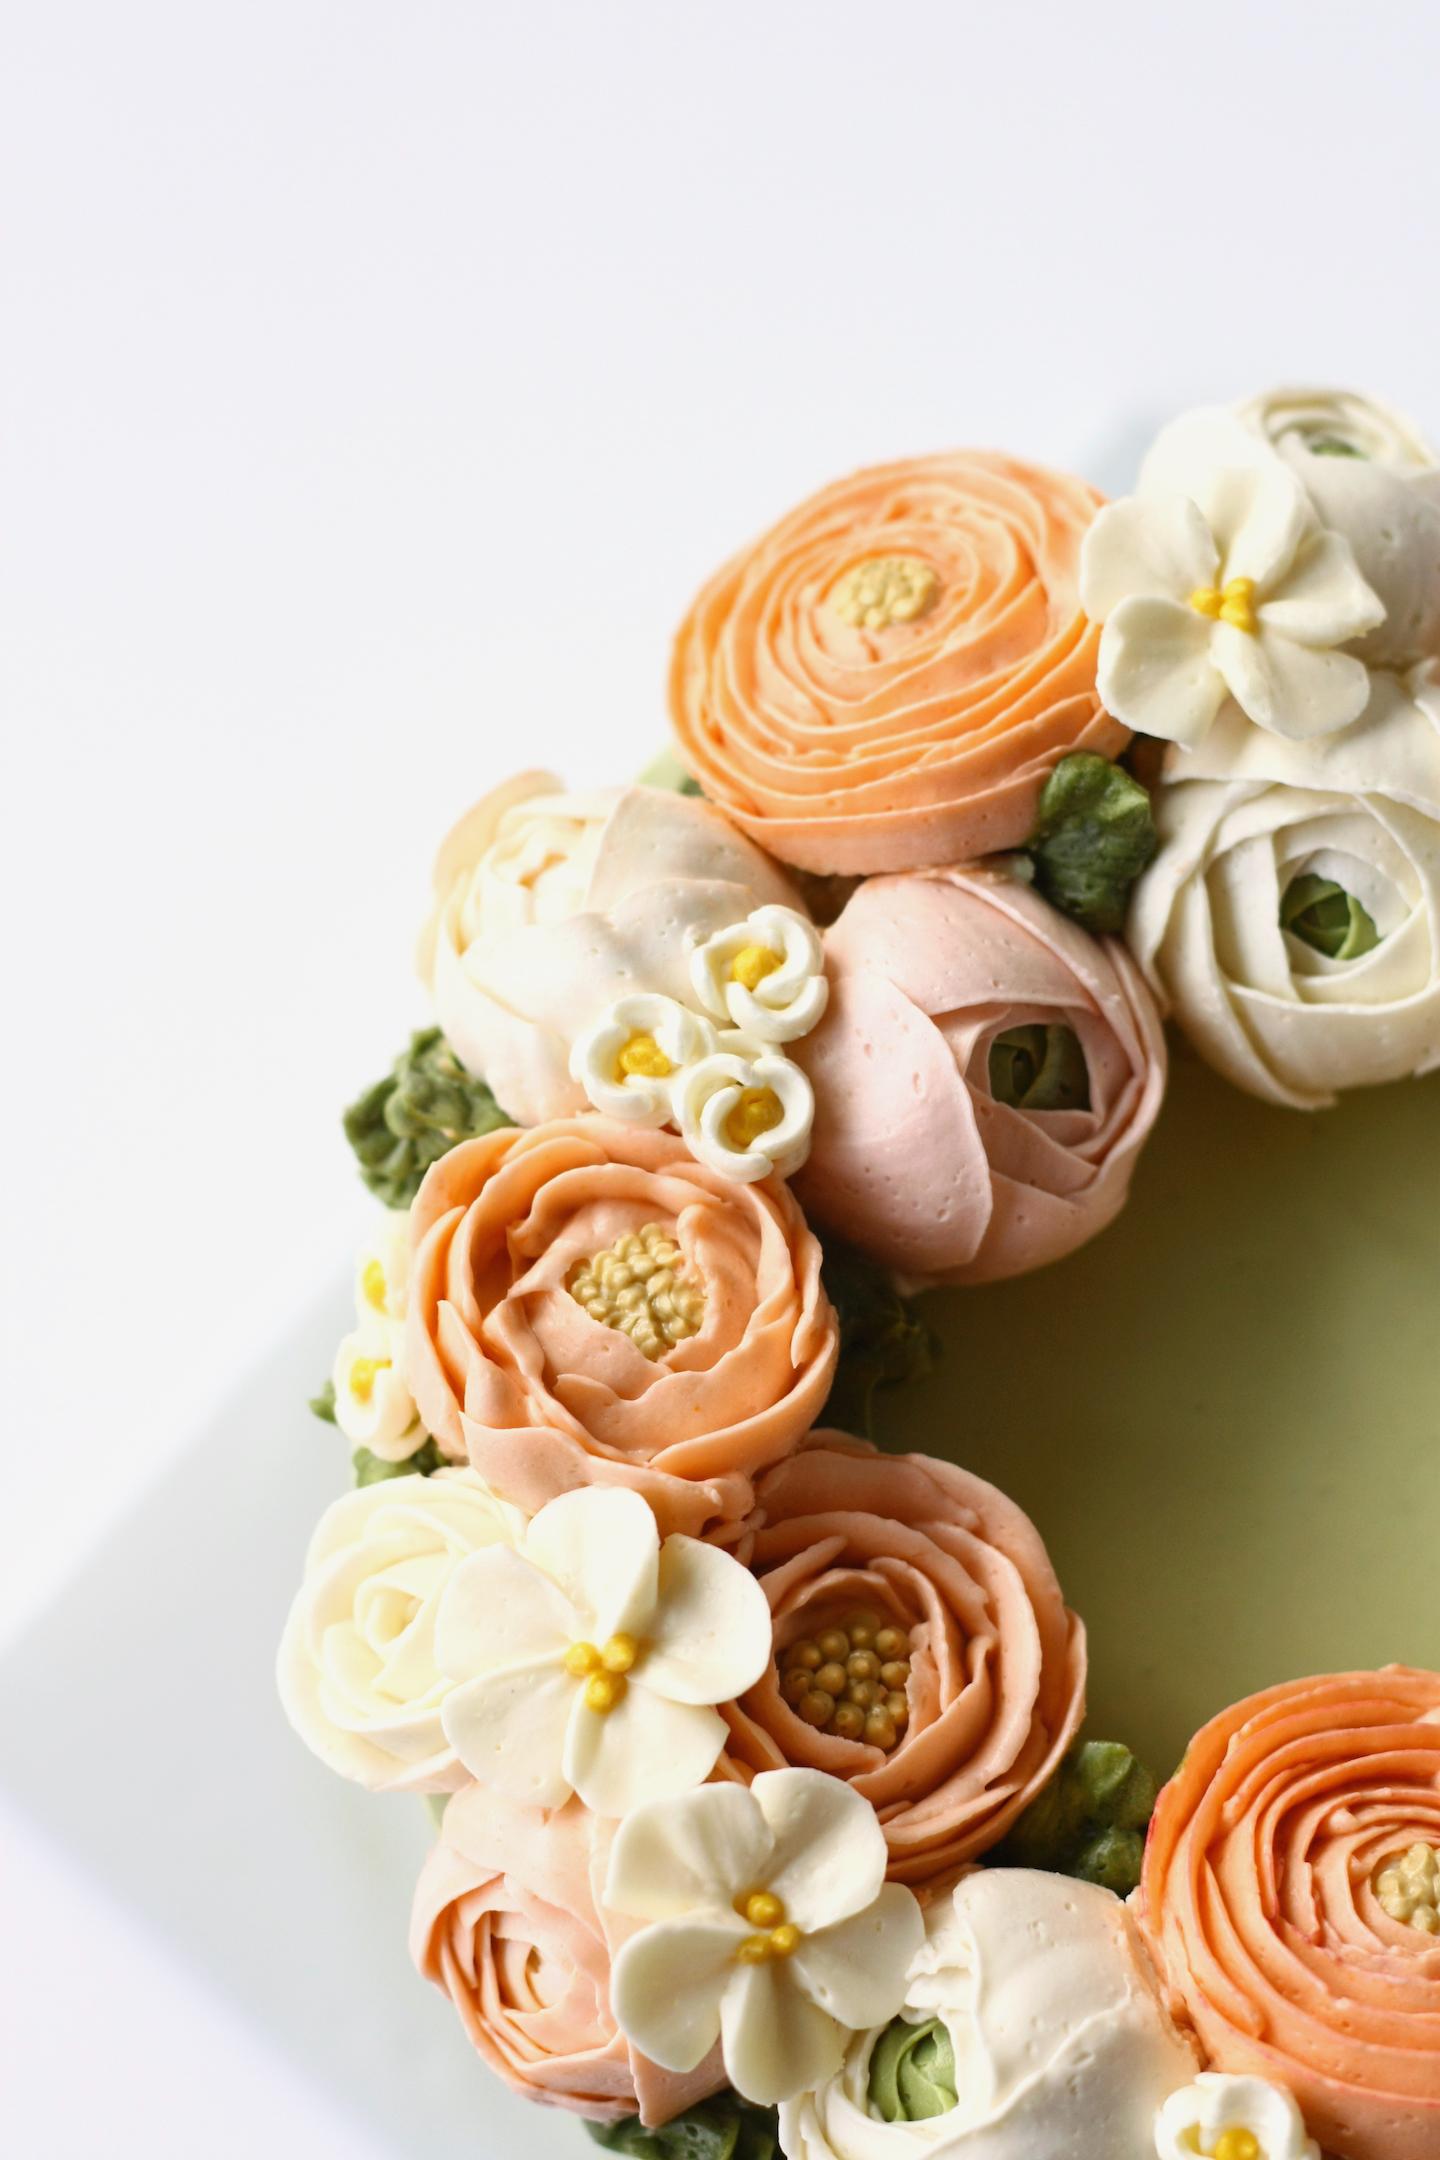 Piped Buttercream Flowers by Bluprint Instructor Liz Shim